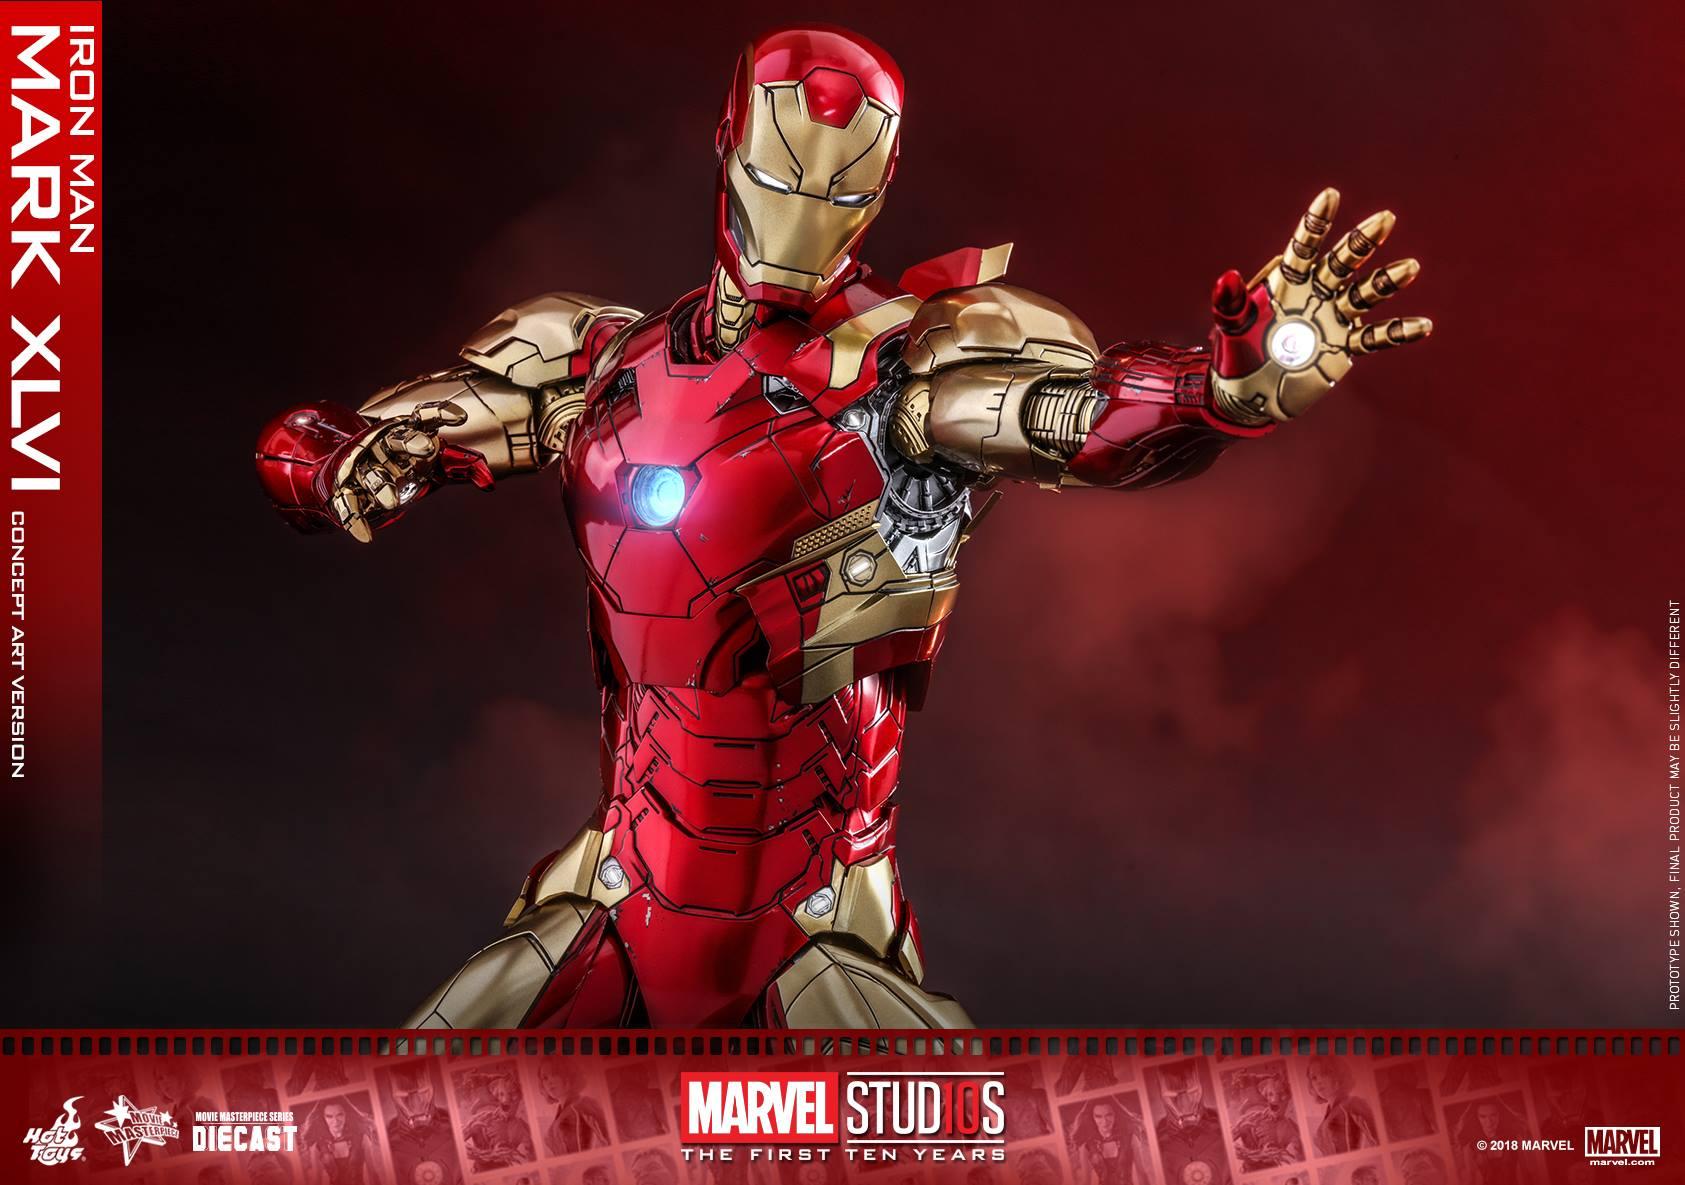 Hot toys Iron man ครบรอบ 10 ปี Marvel Studios